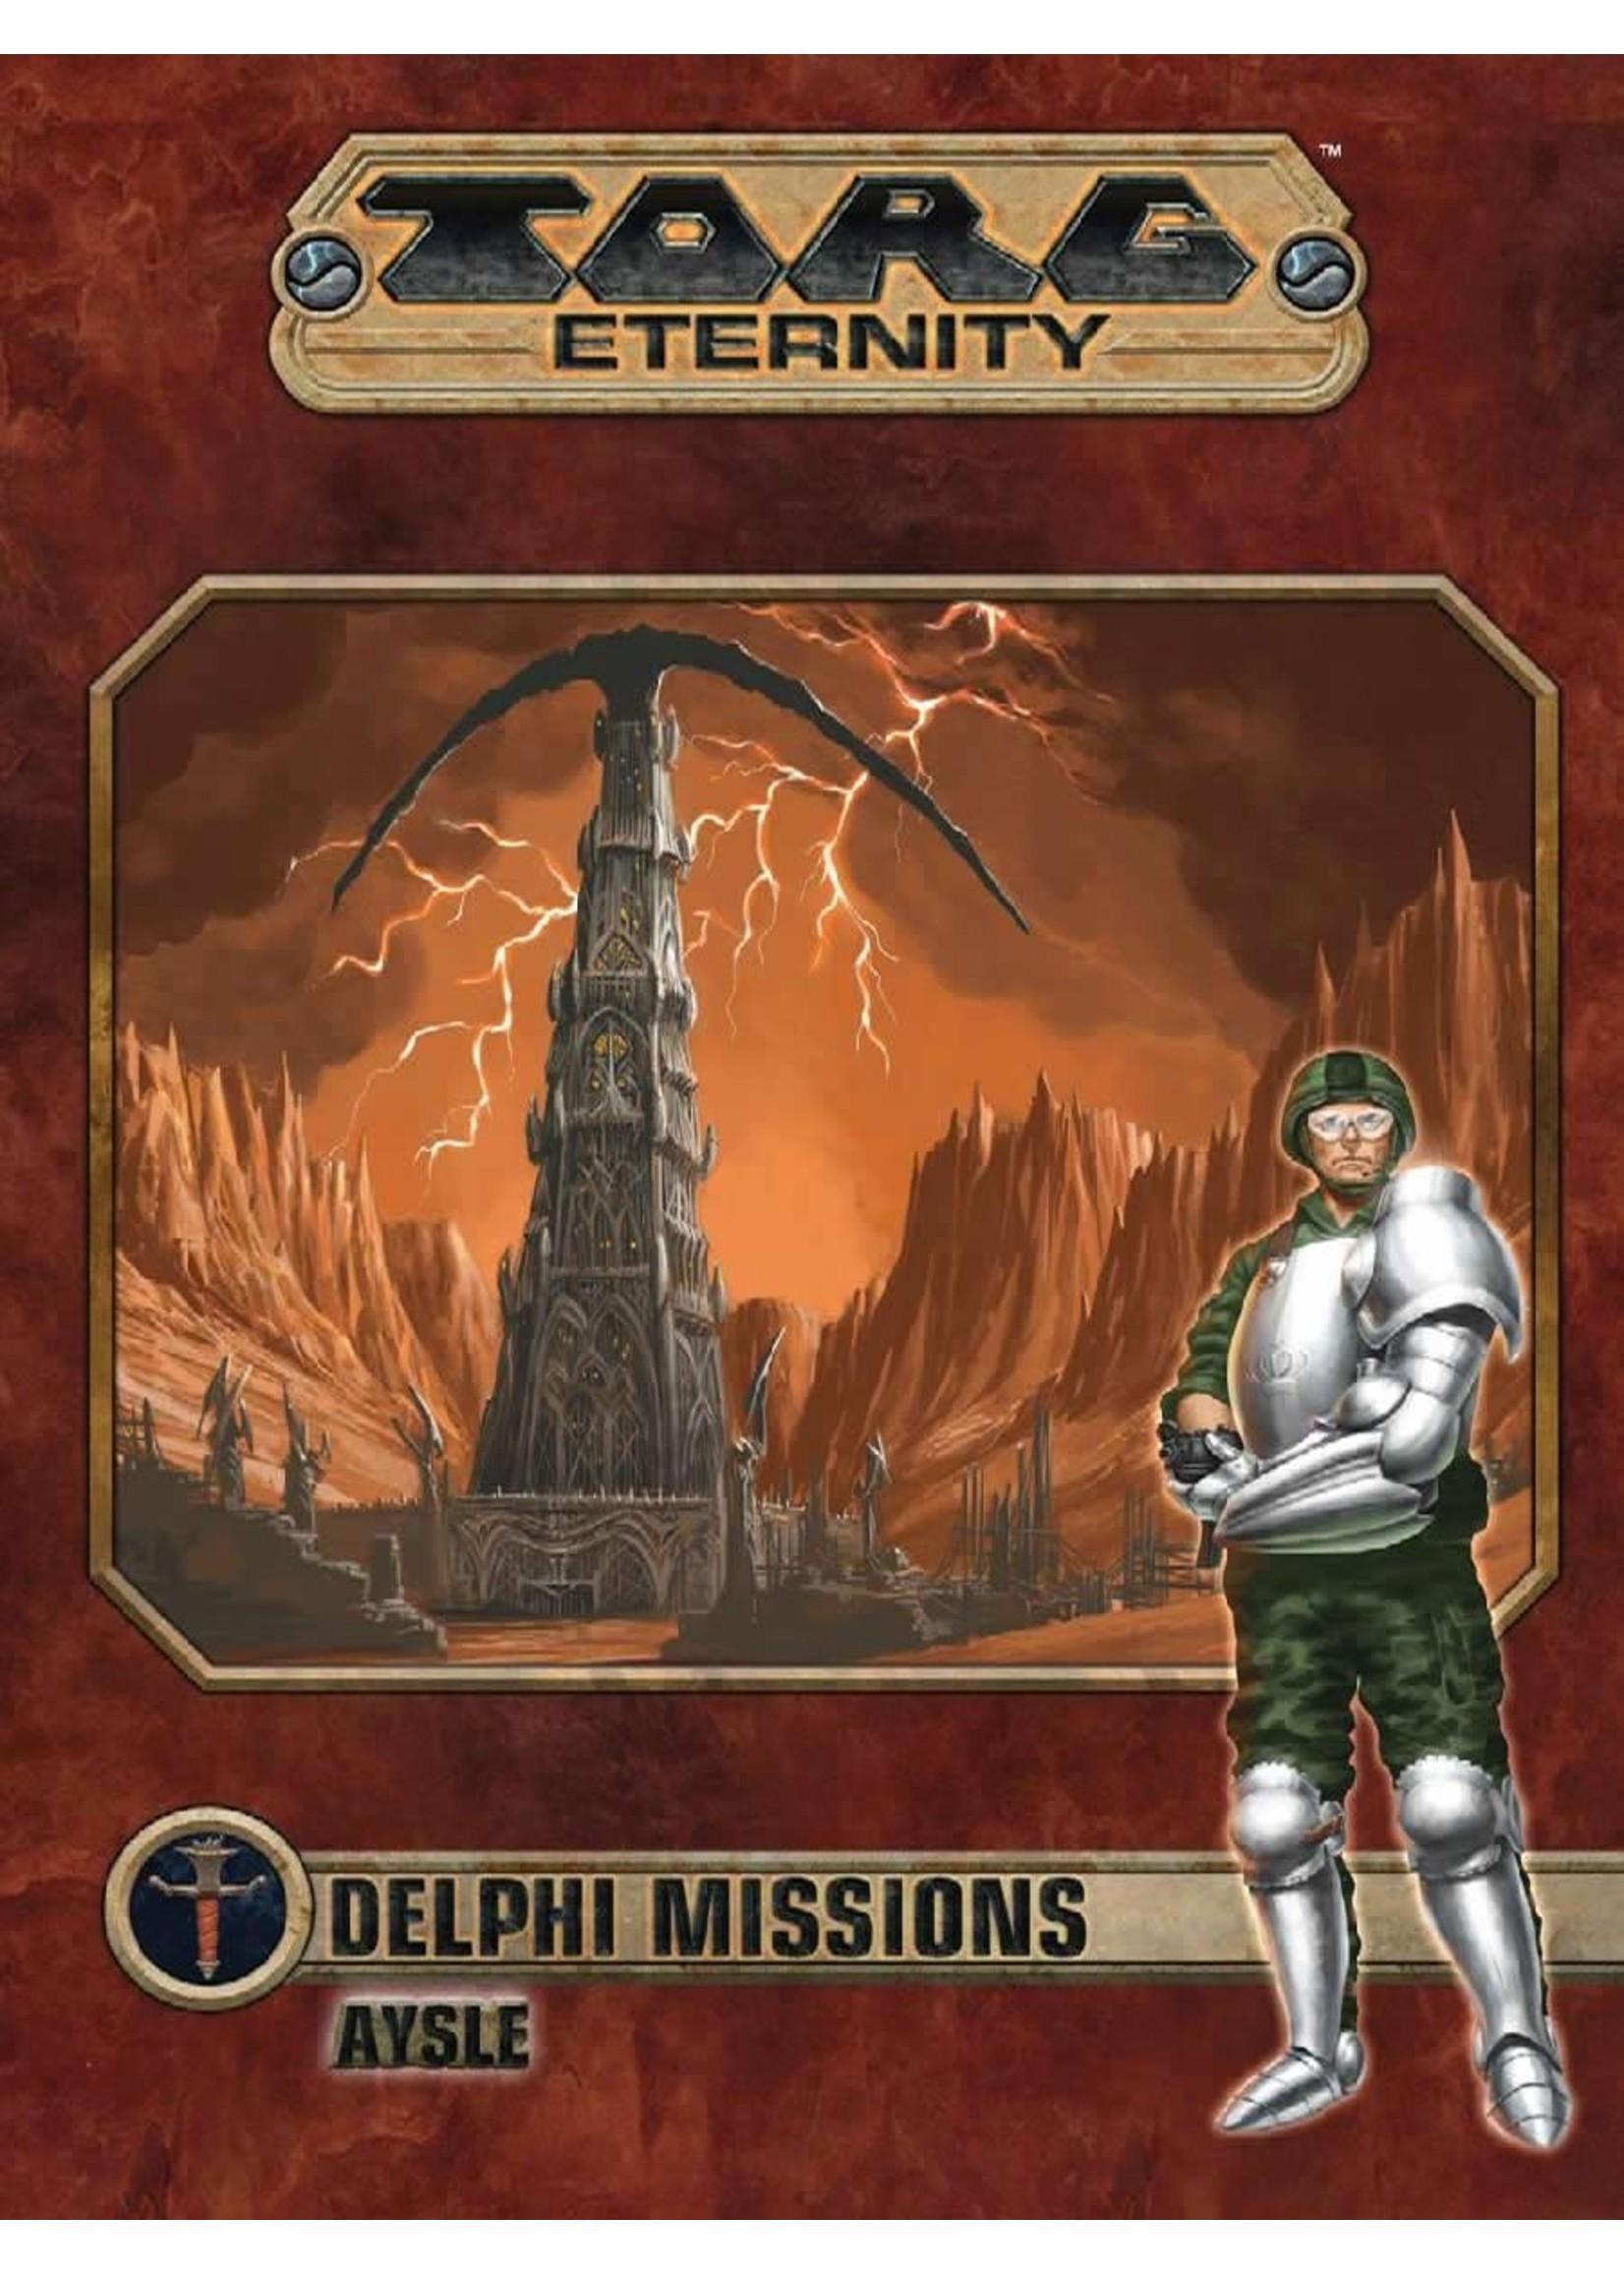 Torg: Aysle - Delphi Missions